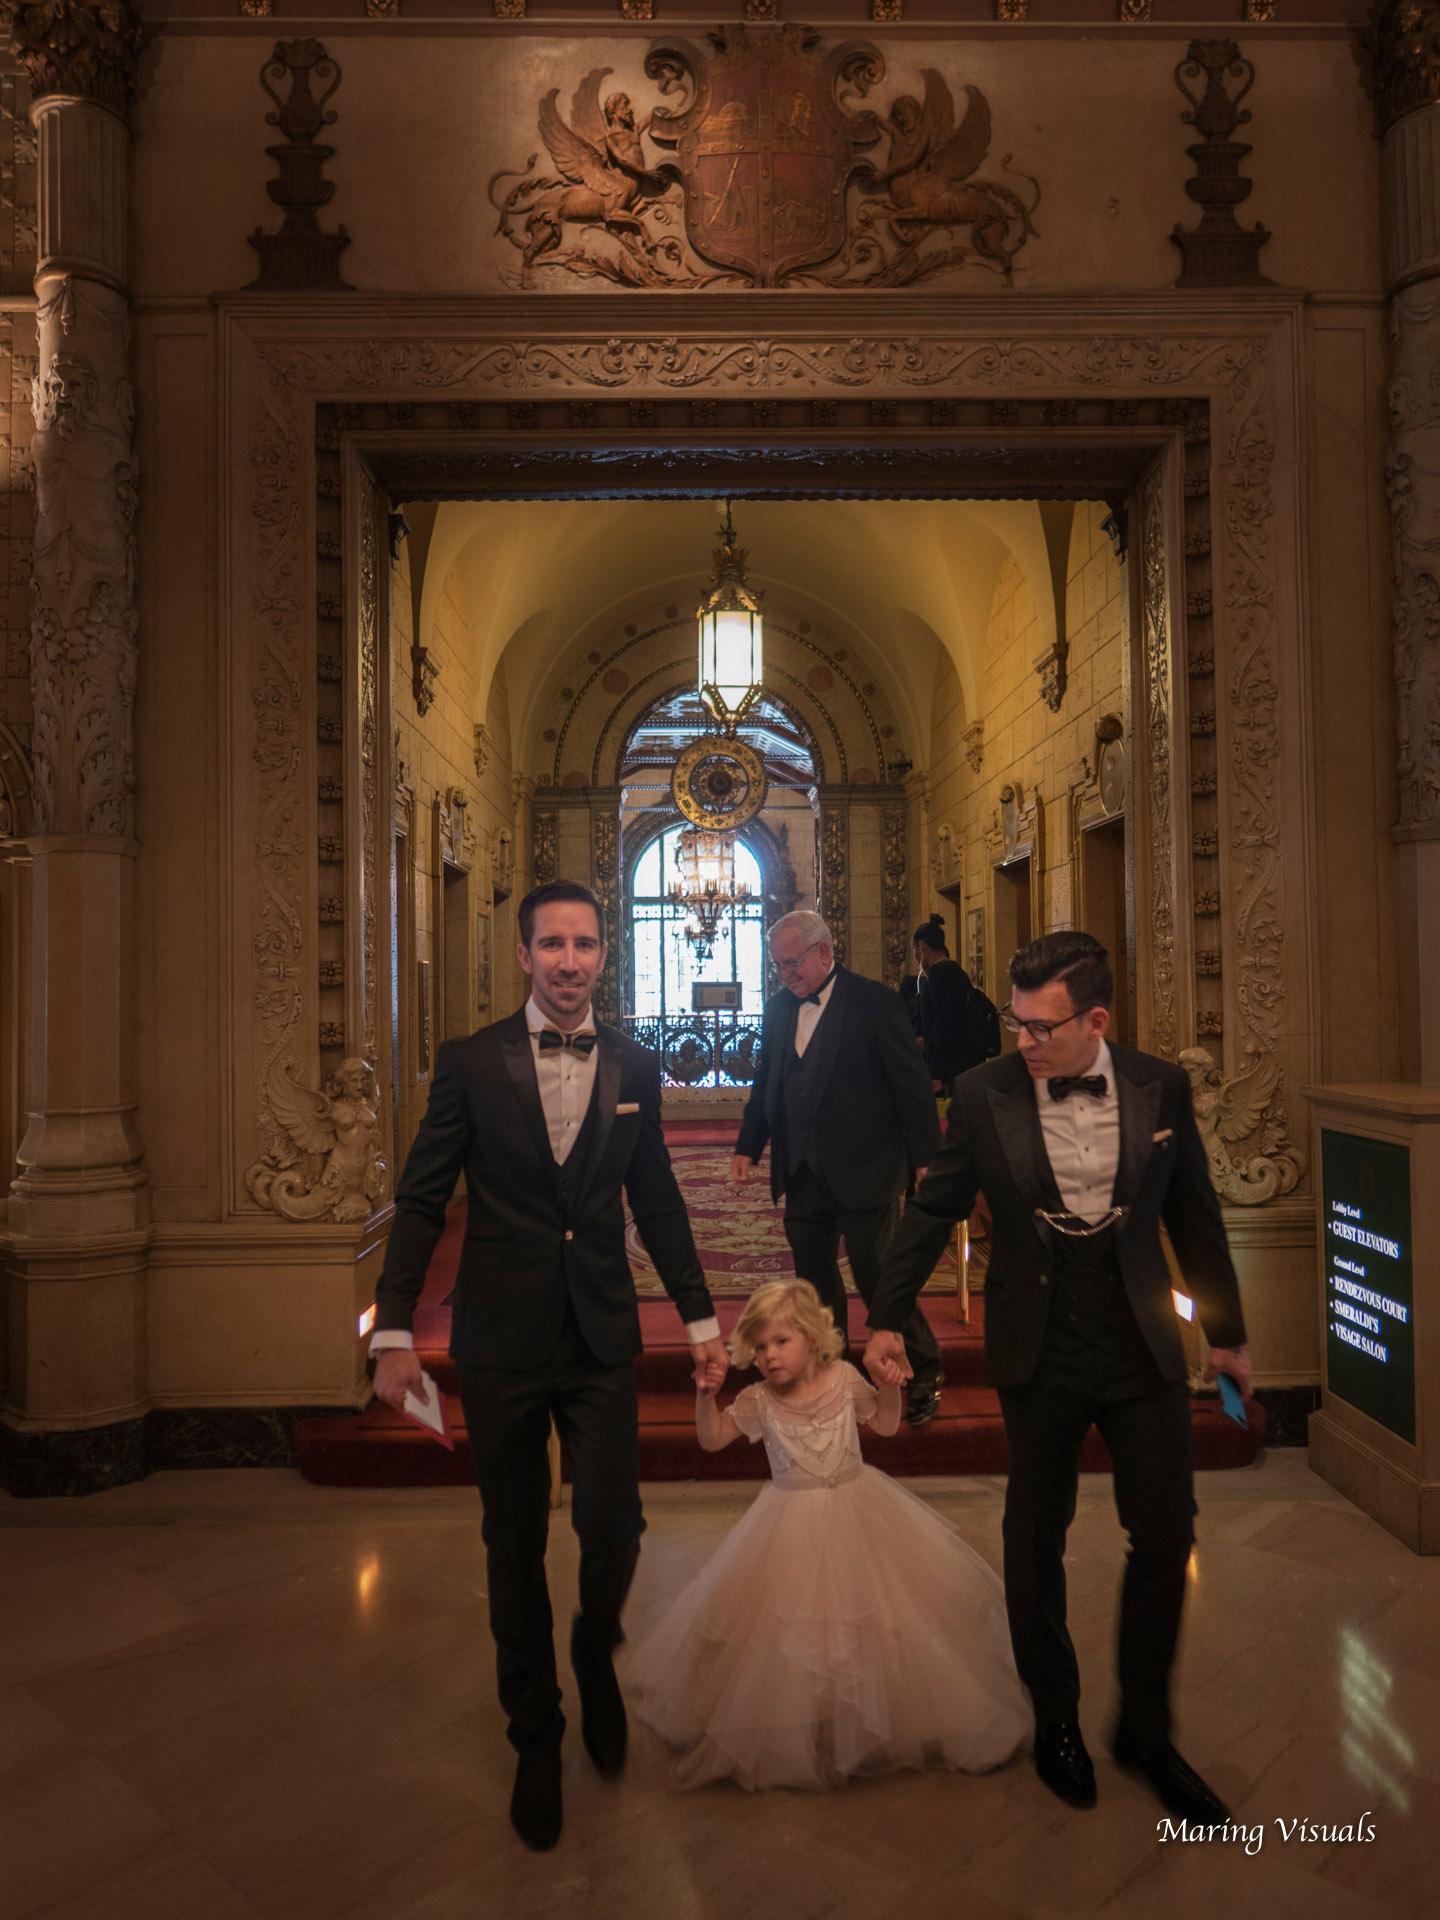 David Tutera Weddings by Maring Visuals 00494.jpg